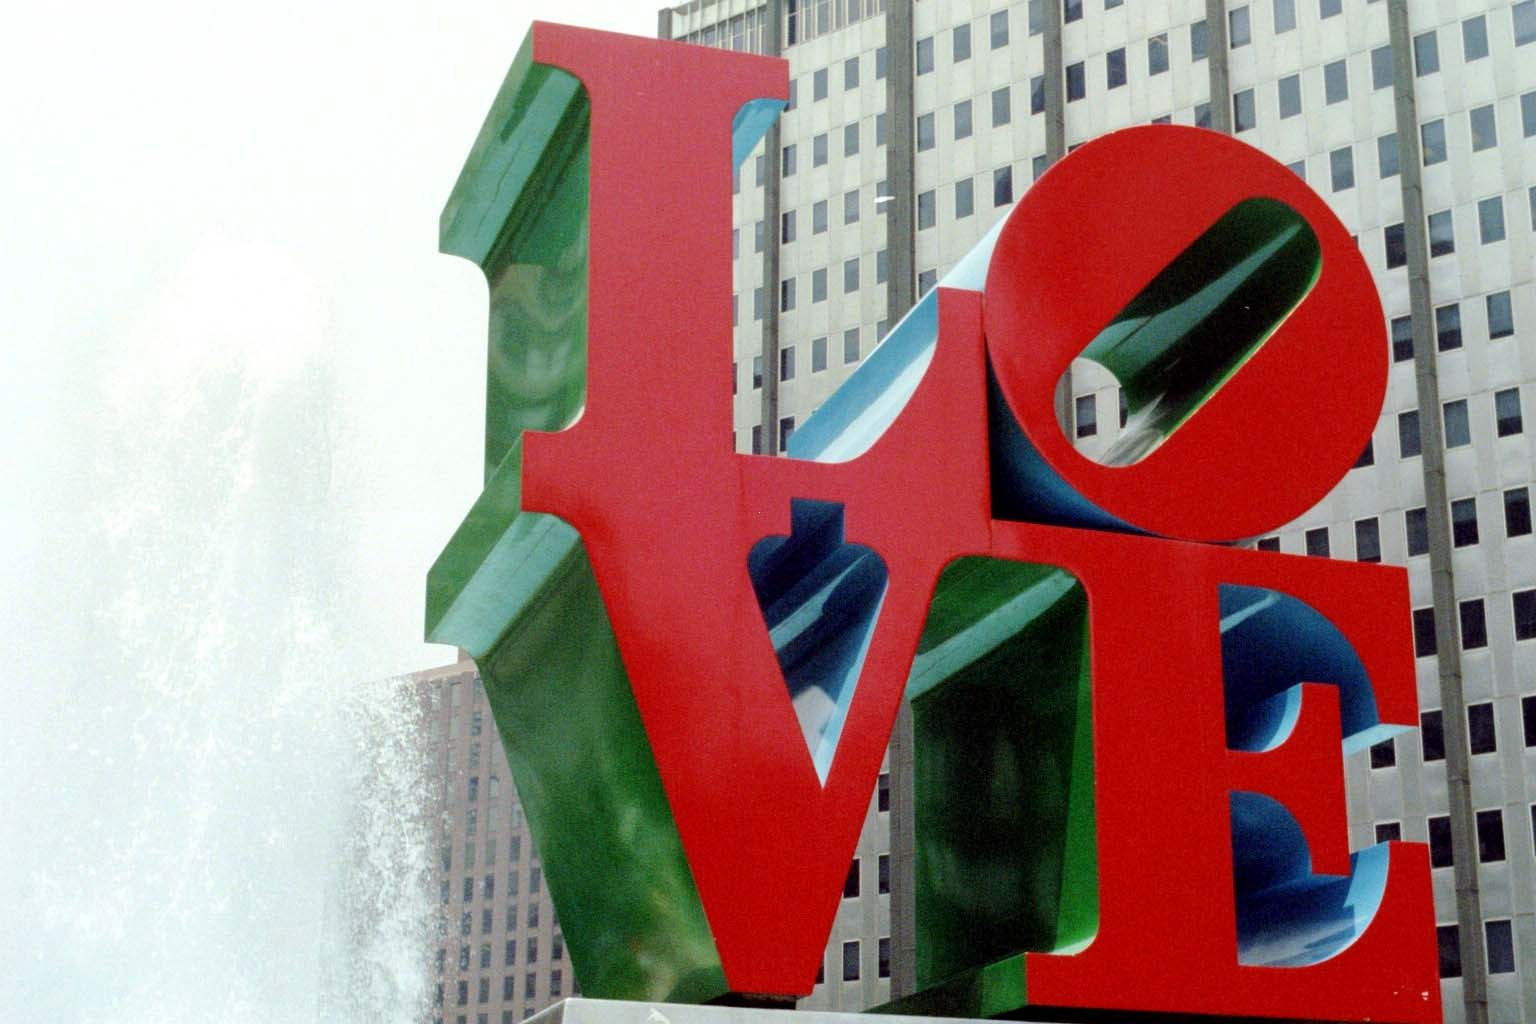 http://upload.wikimedia.org/wikipedia/commons/c/c9/Love01.jpg